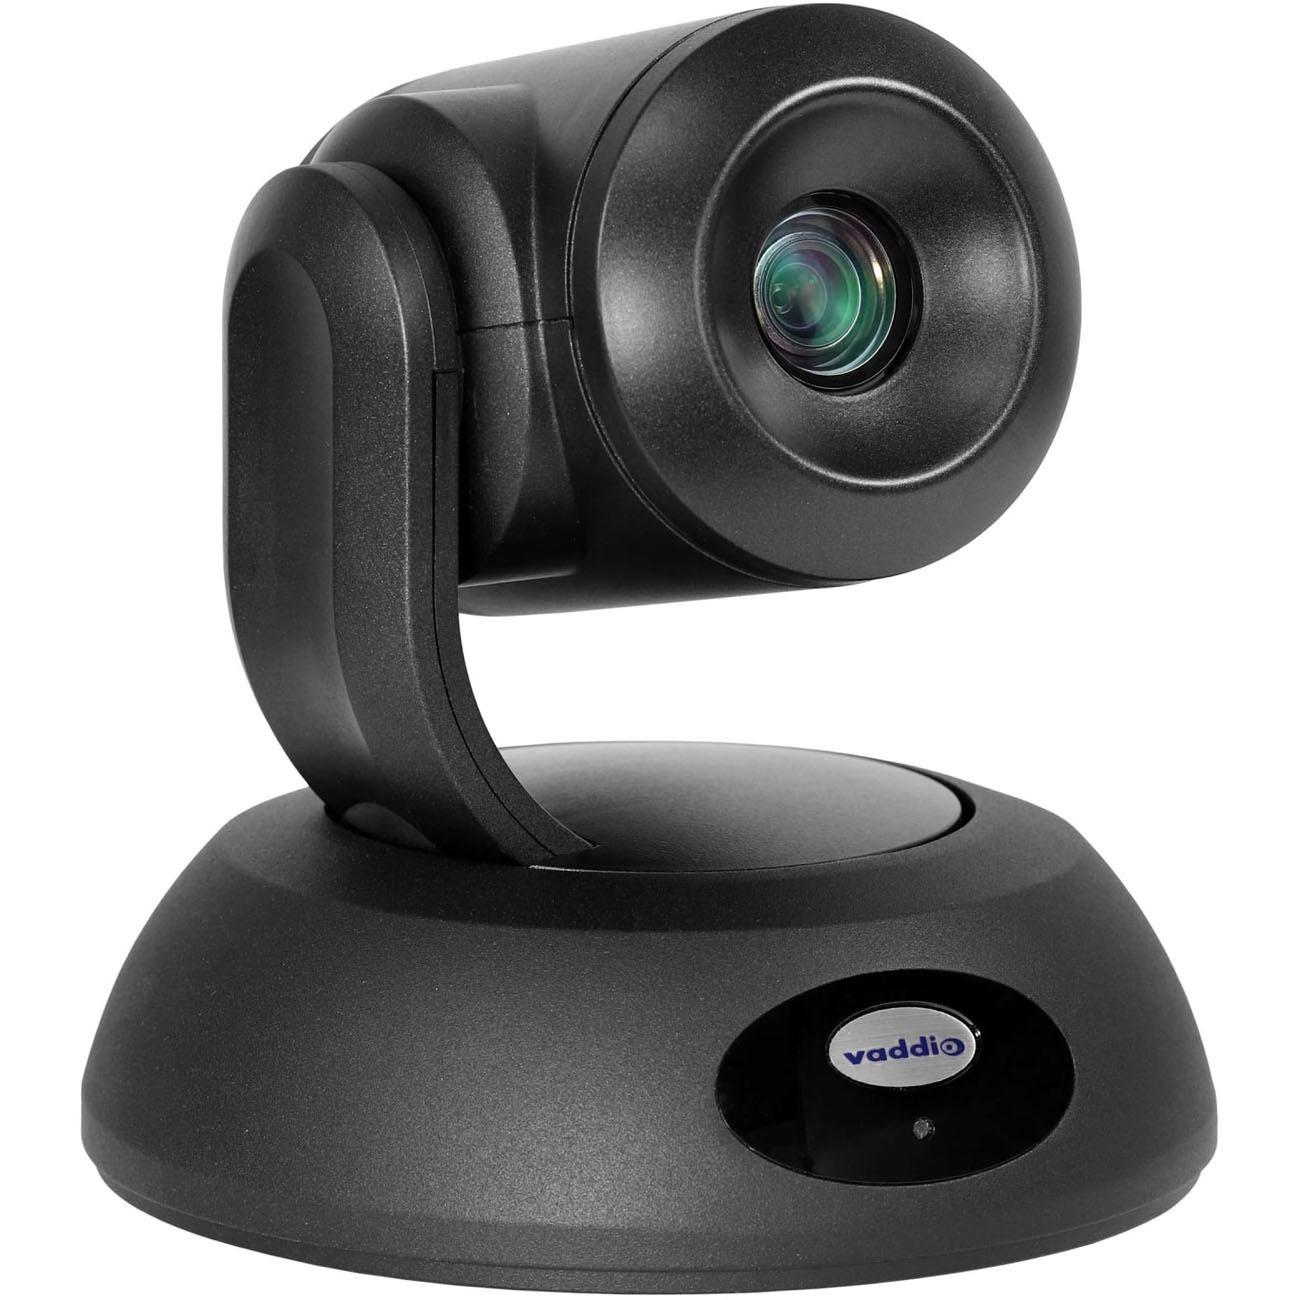 Vaddio RoboSHOT Elite Video Conferencing Camera - 8.5 Megapixel - 60 fps - Black - USB 3.0 - 1 Pack(s)_subImage_1